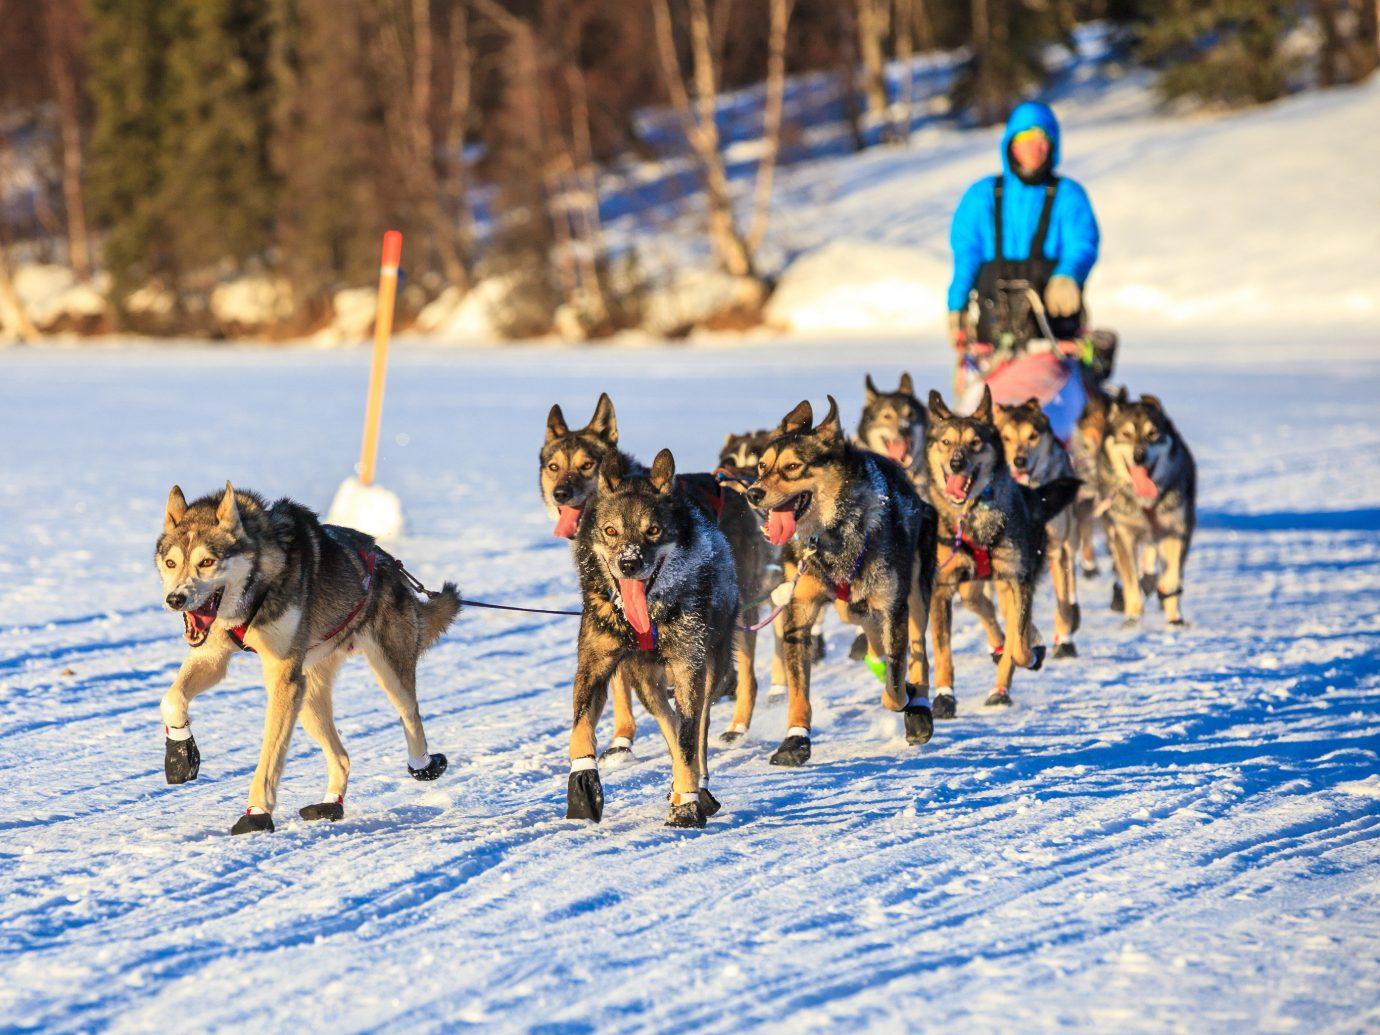 Hotels snow outdoor Dog mushing mammal Winter sled dog racing vehicle dog sled season transport dog like mammal